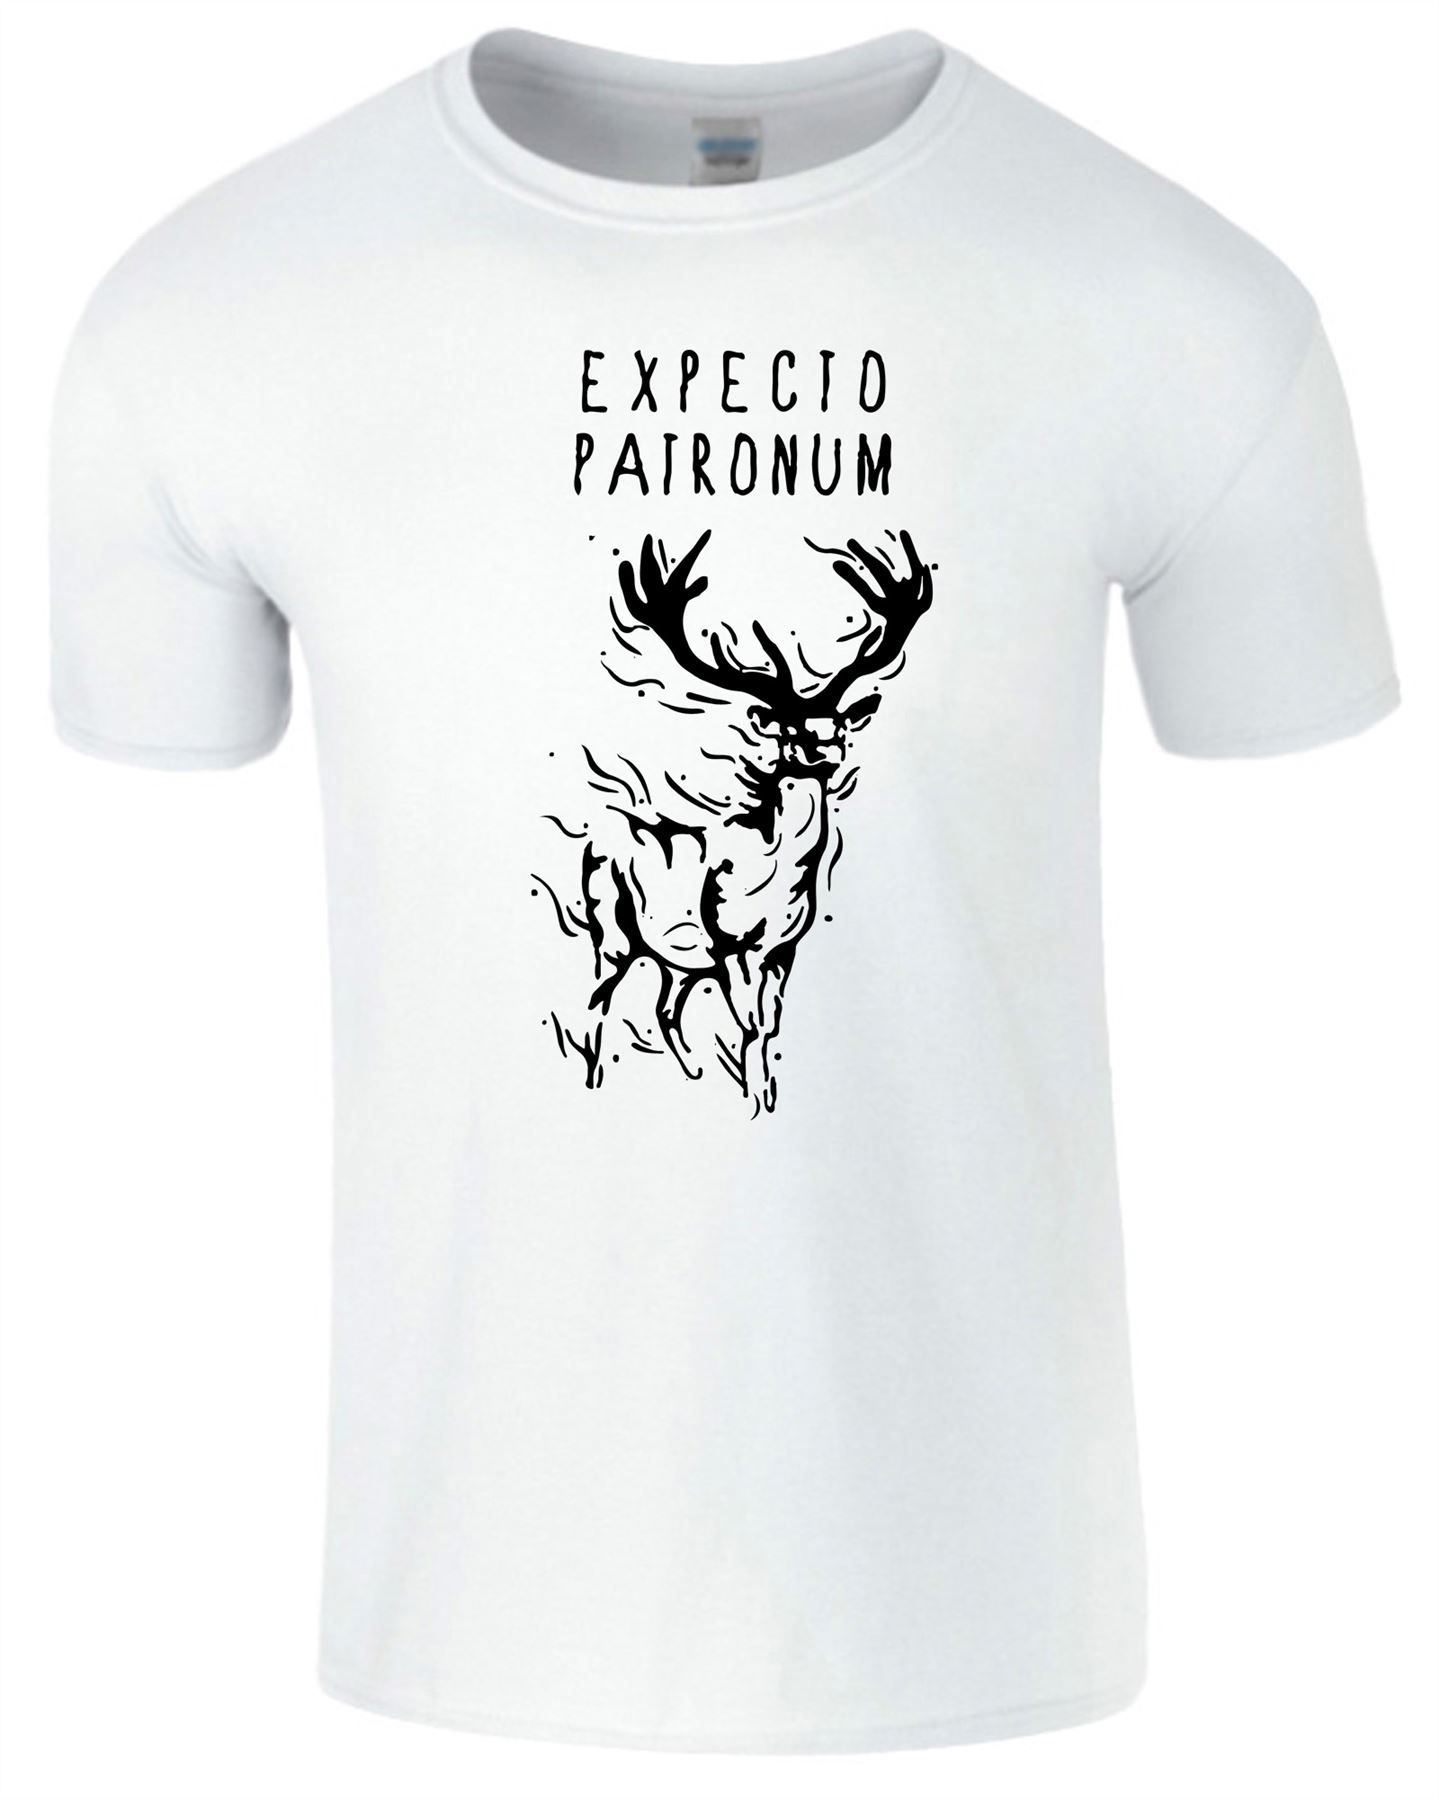 Expecto Patronum Ladies T shirt Harry Potter Deathly Hallows Magic Top Tshirt